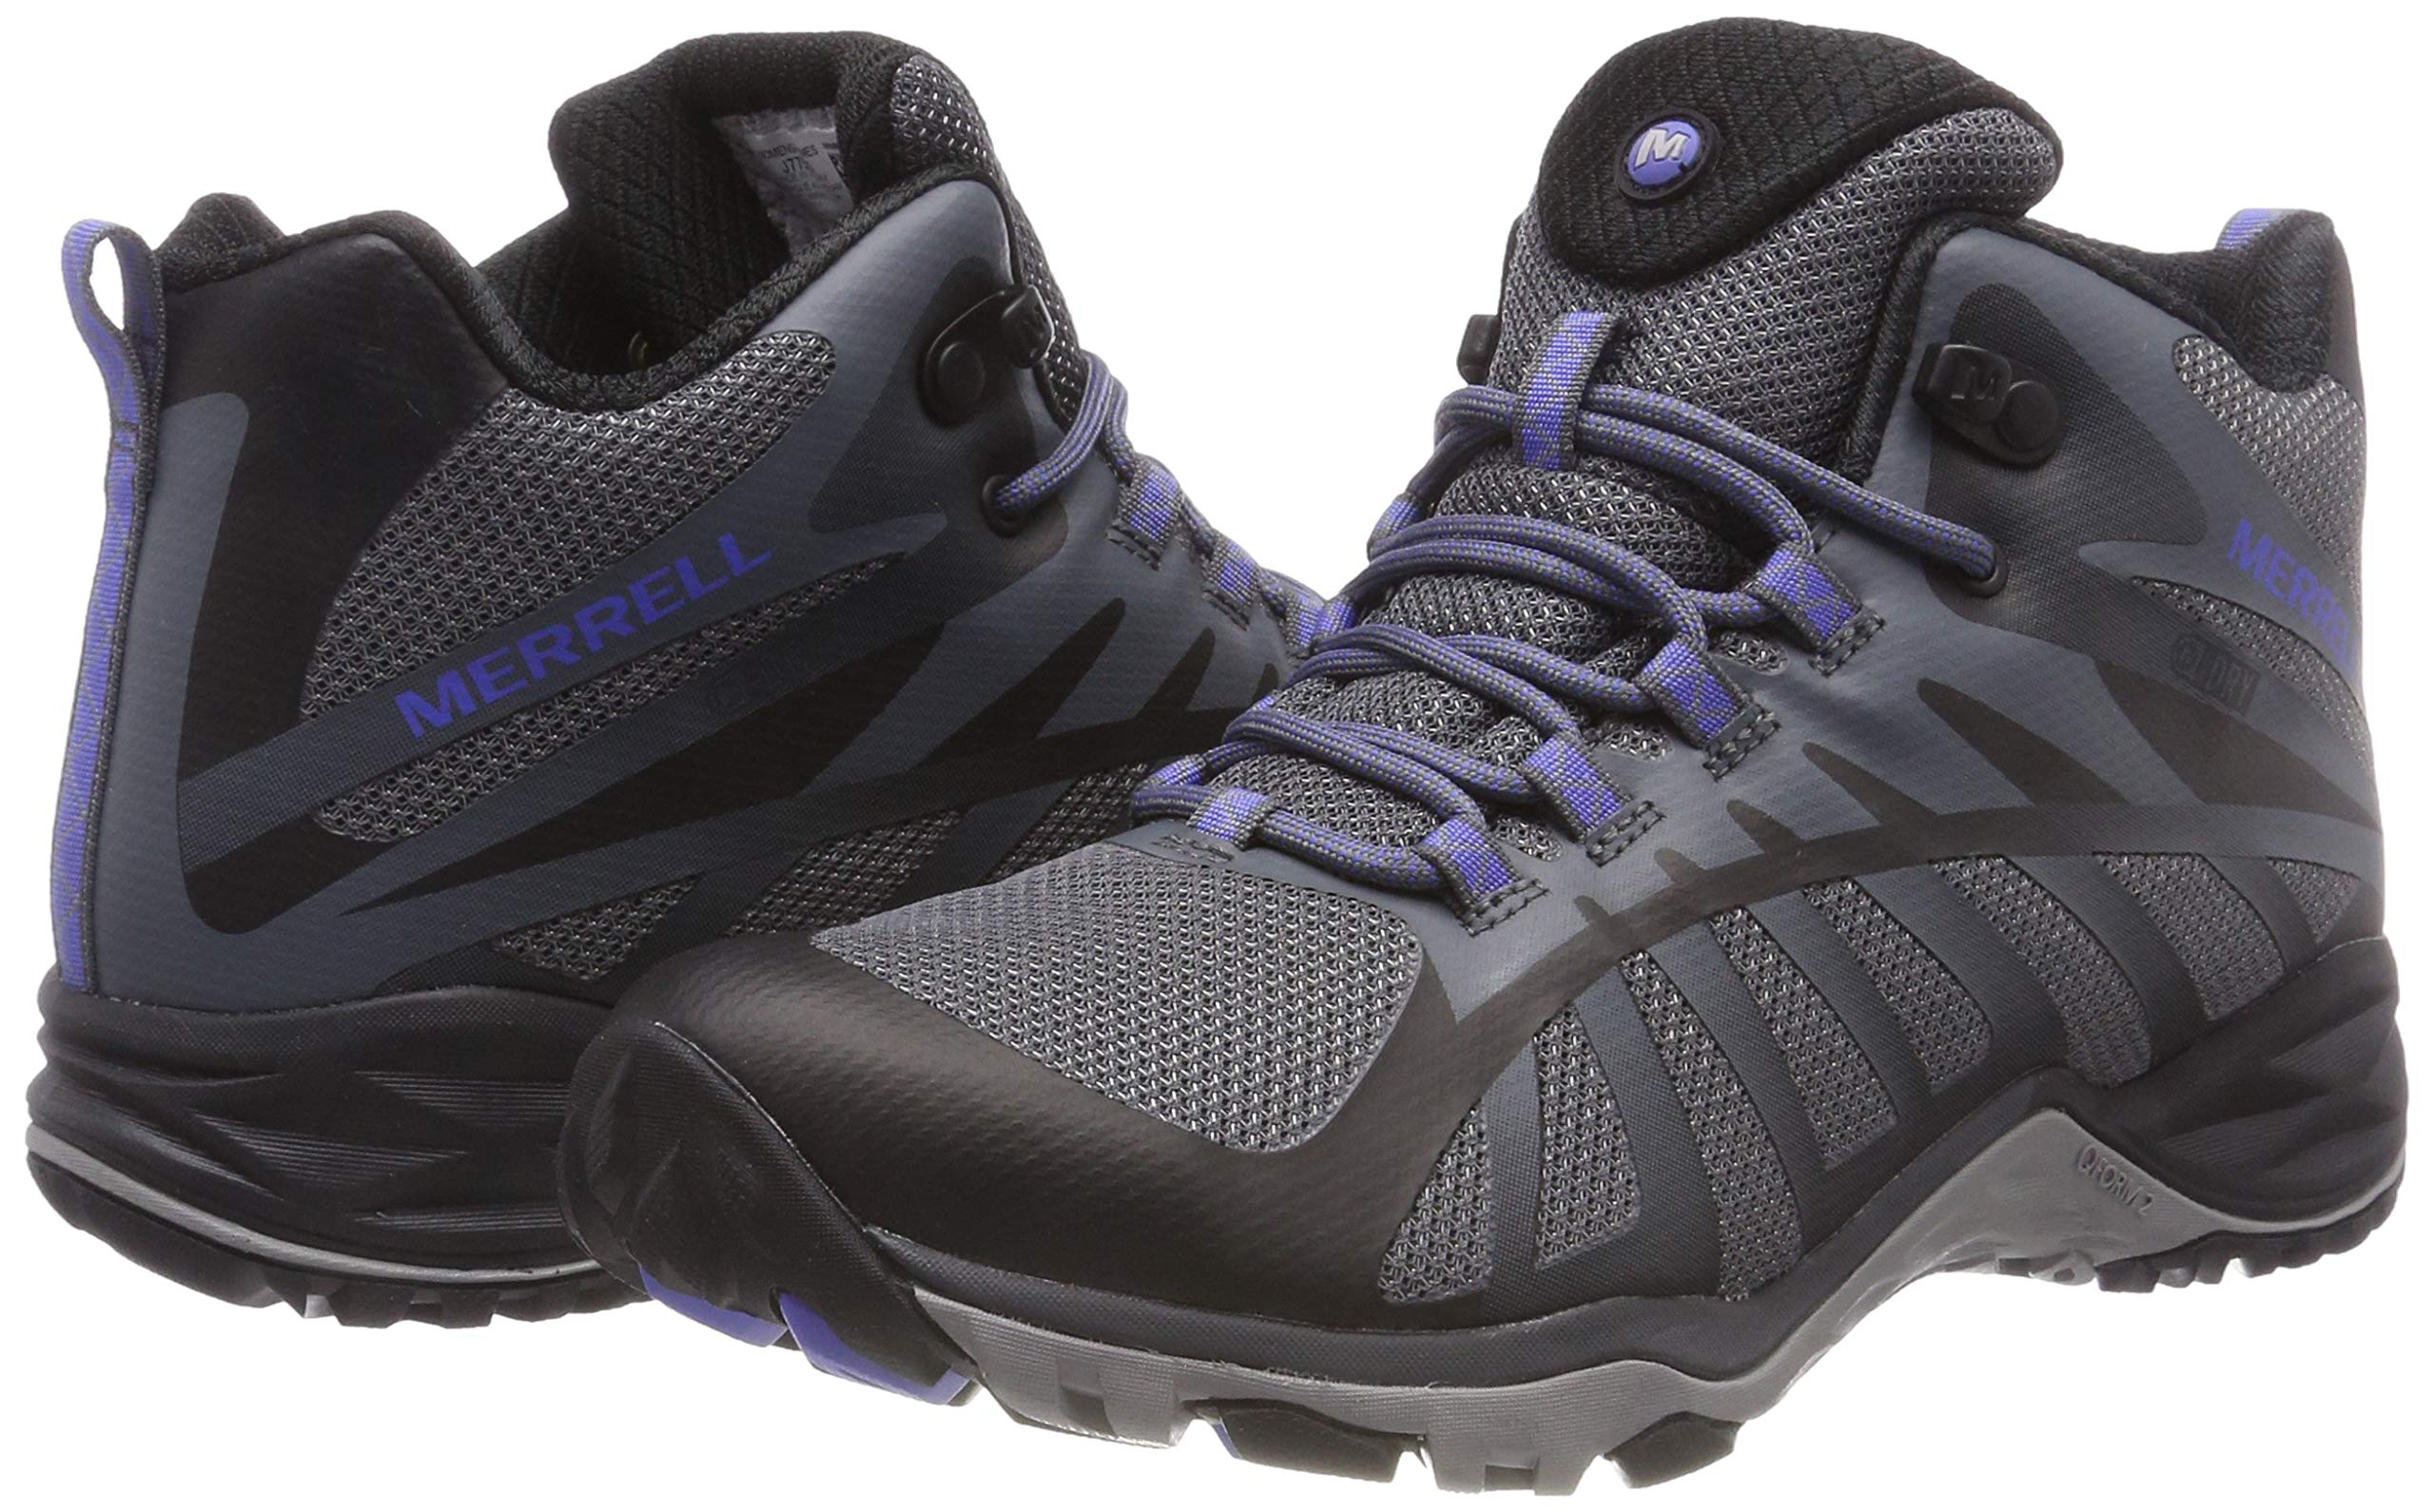 81lXqx3hpnL - Merrell Women's Siren Edge Q2 Mid Wp High Rise Hiking Boots